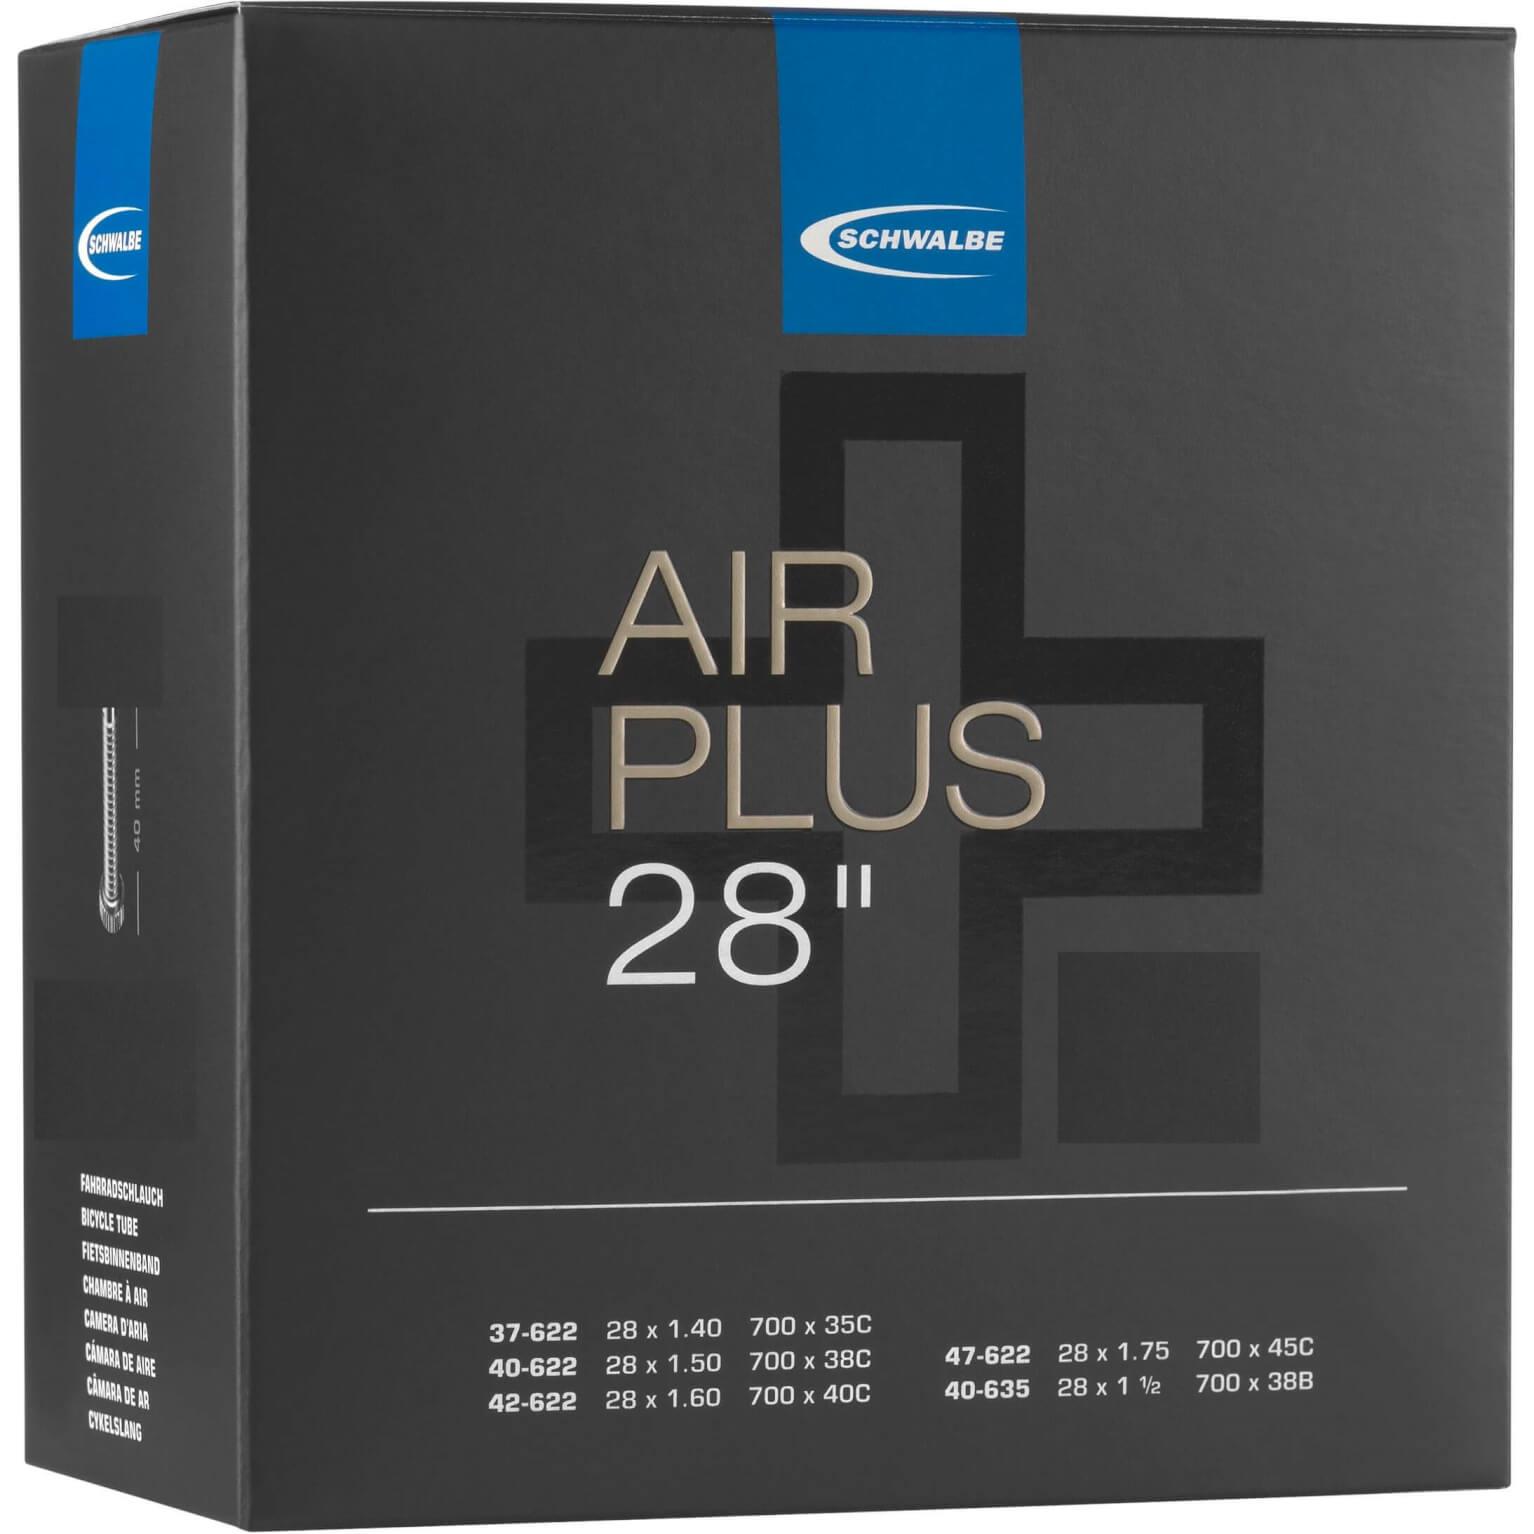 Schwalbe binnenband Air Plus 28 inch 37/47622/635 Dunlop ventiel